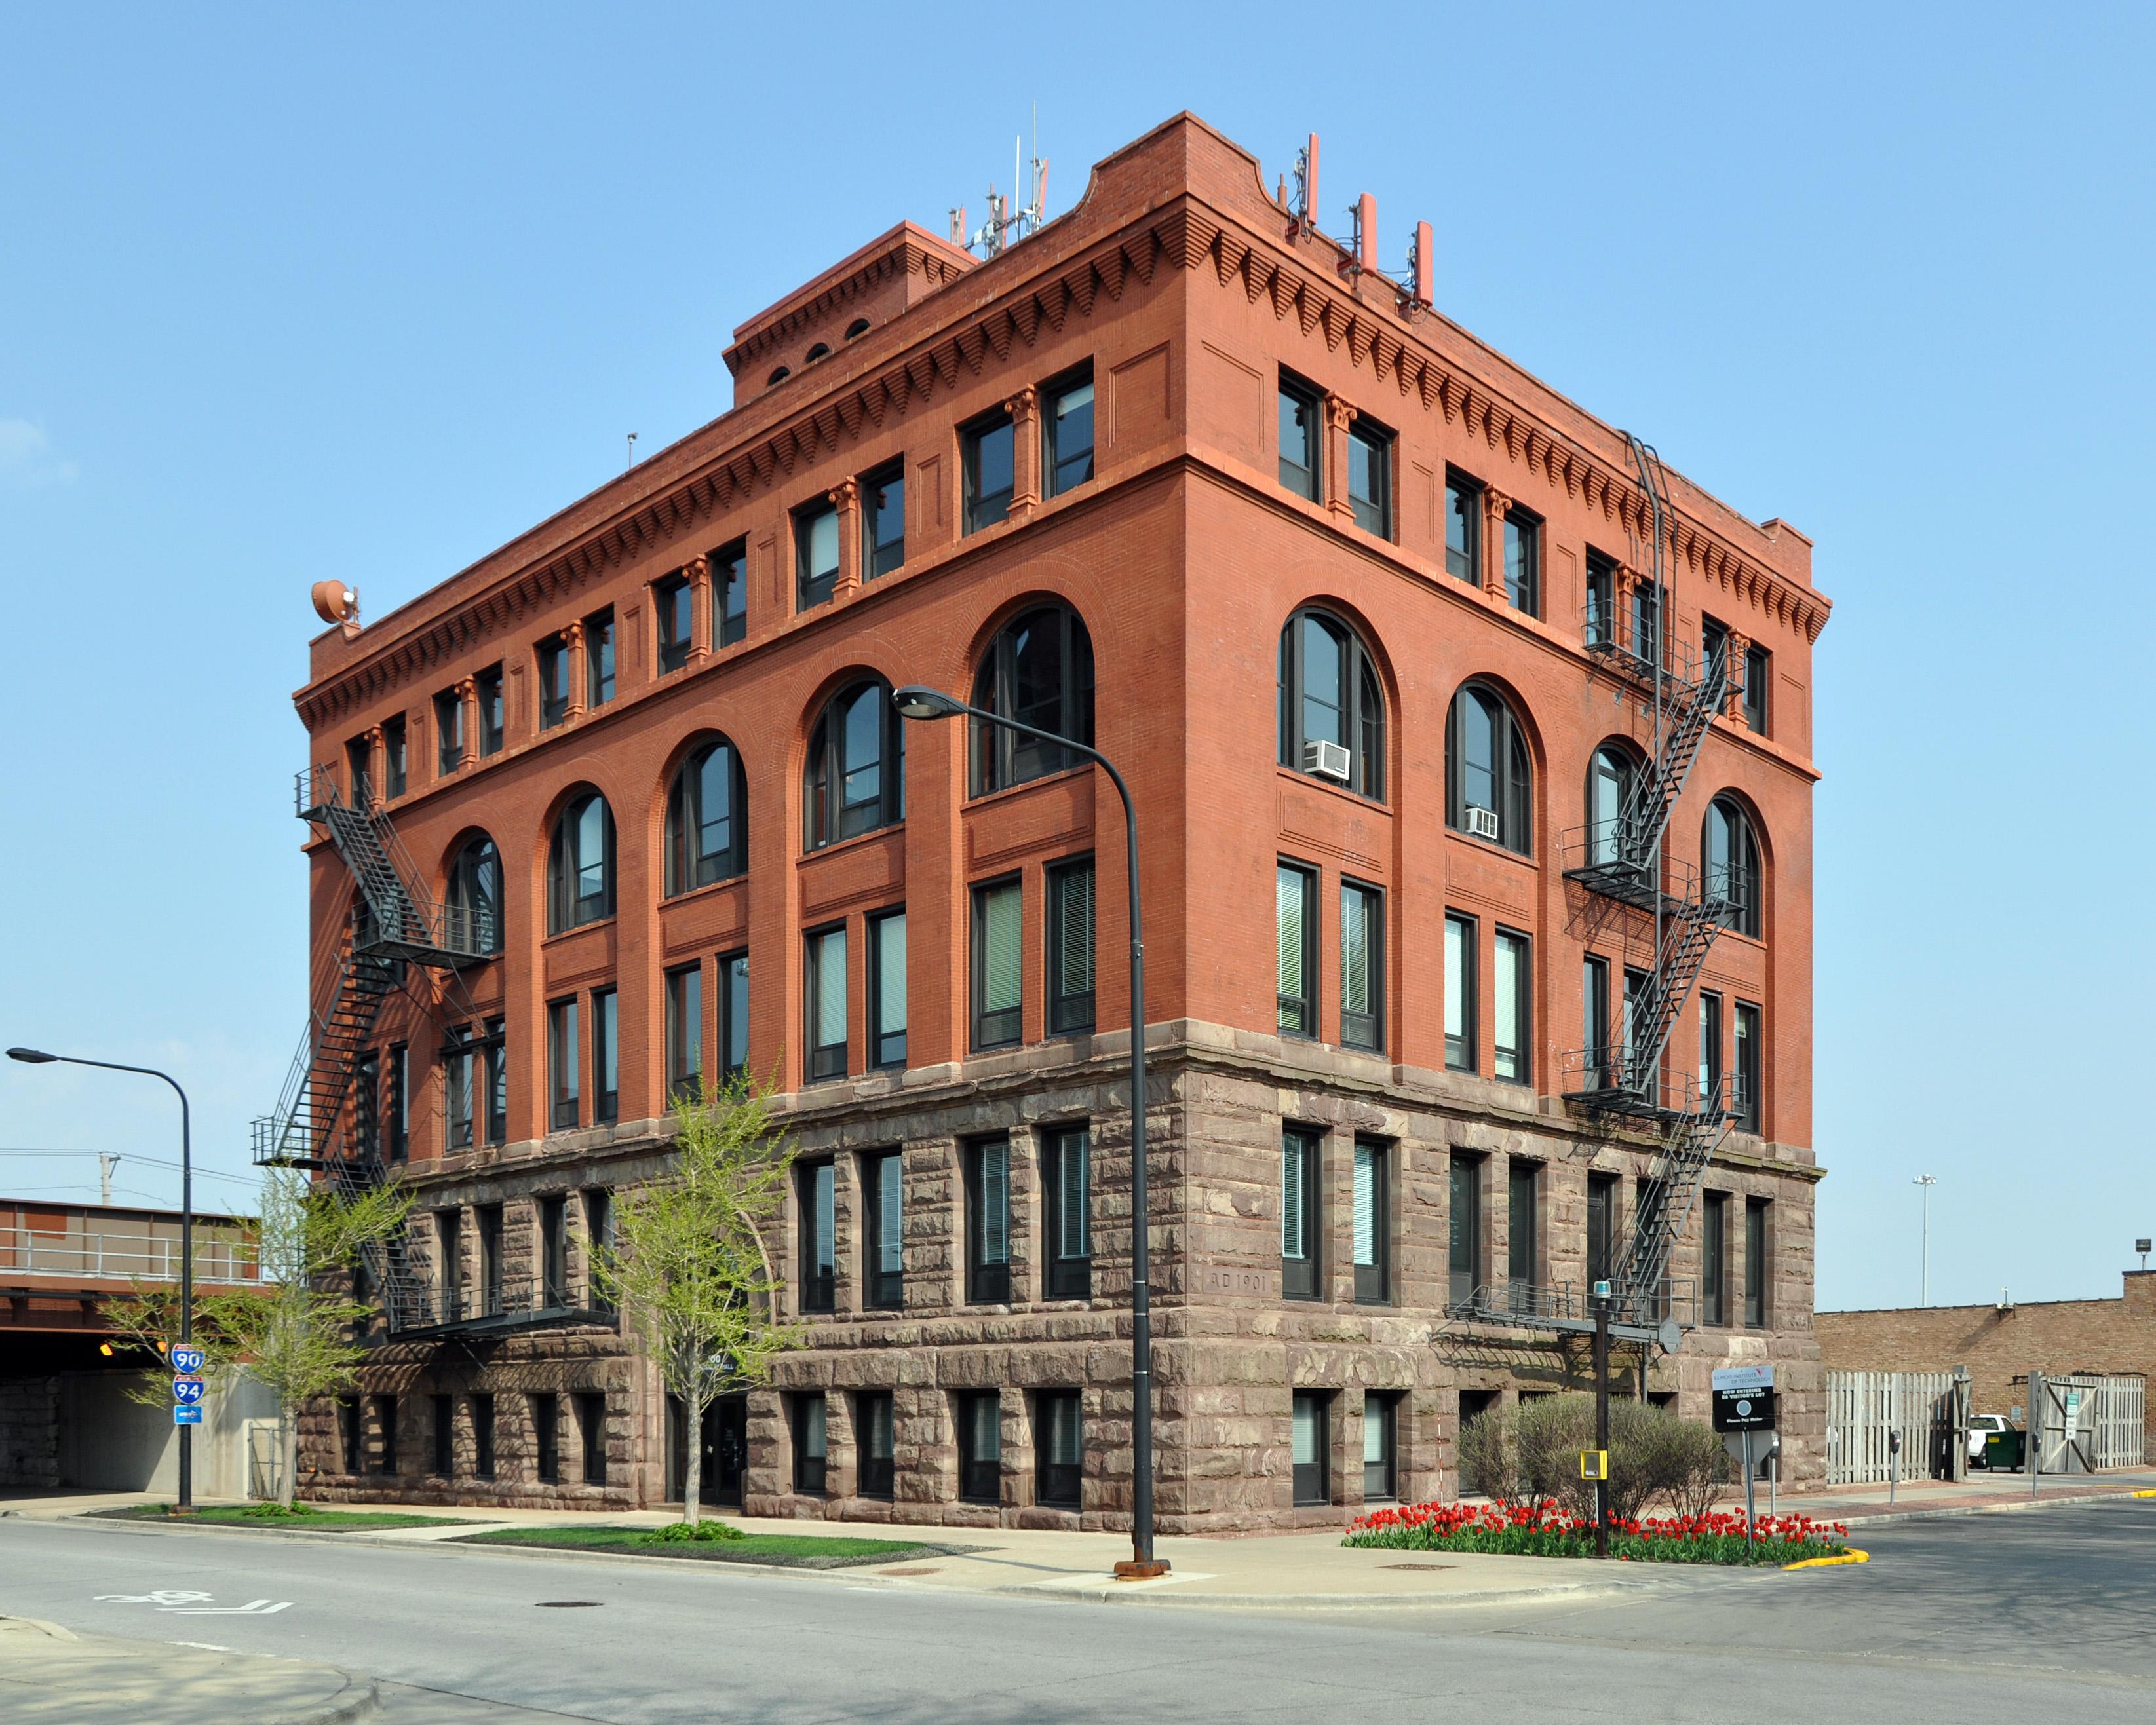 Historic Chicago Architecture illinois institute of technology - wikipedia